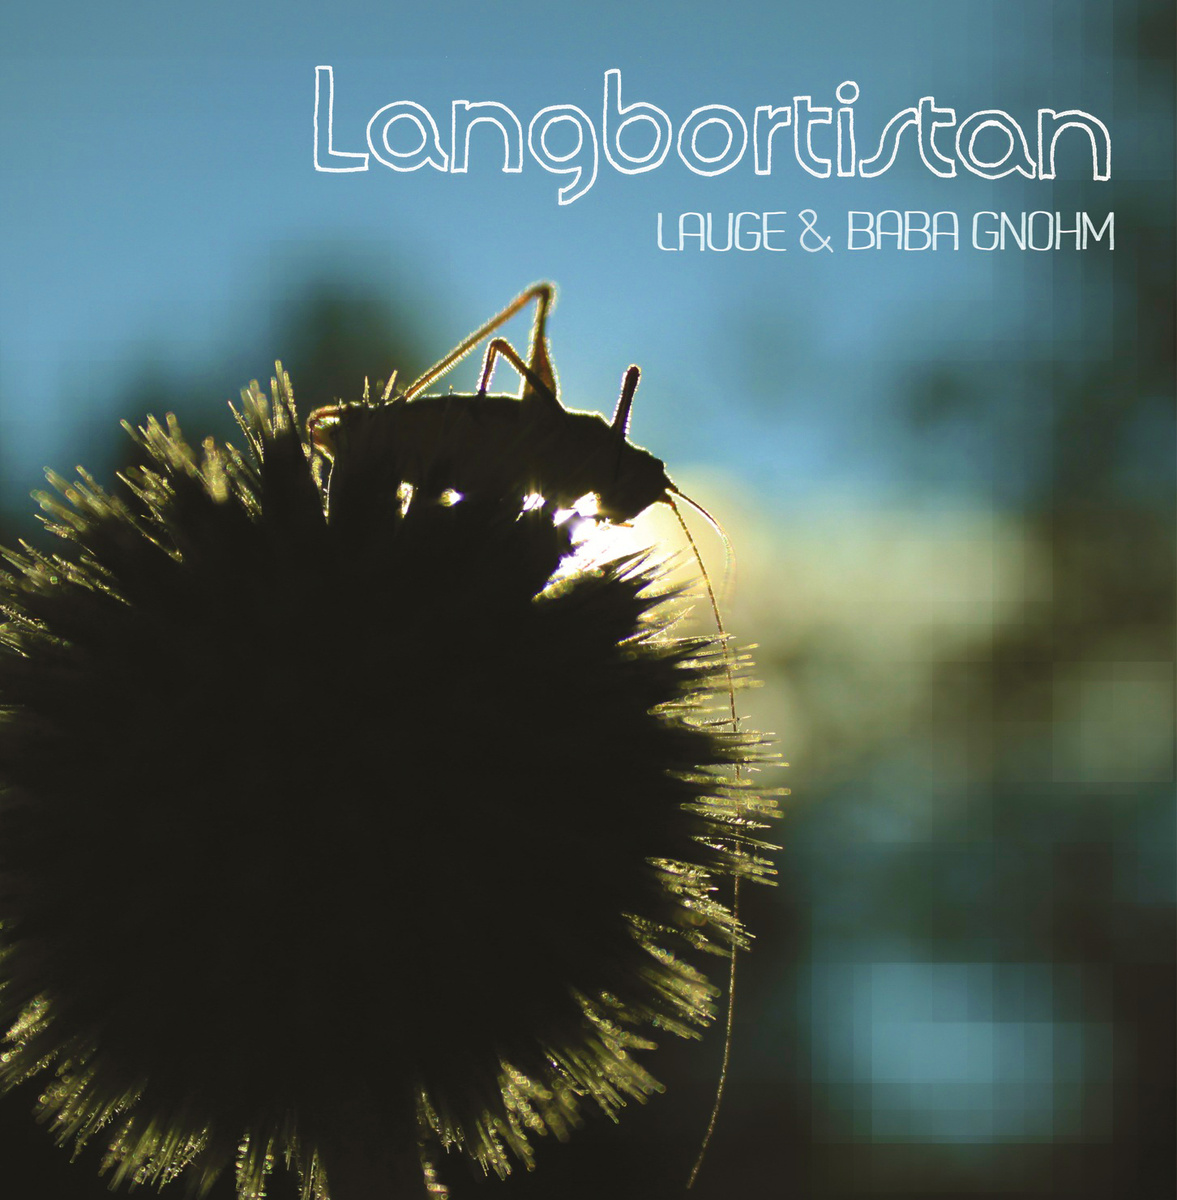 Lauge & Baba Gnohm - Dybet @ 'Langbortistan' album (baba gnohm, cd)